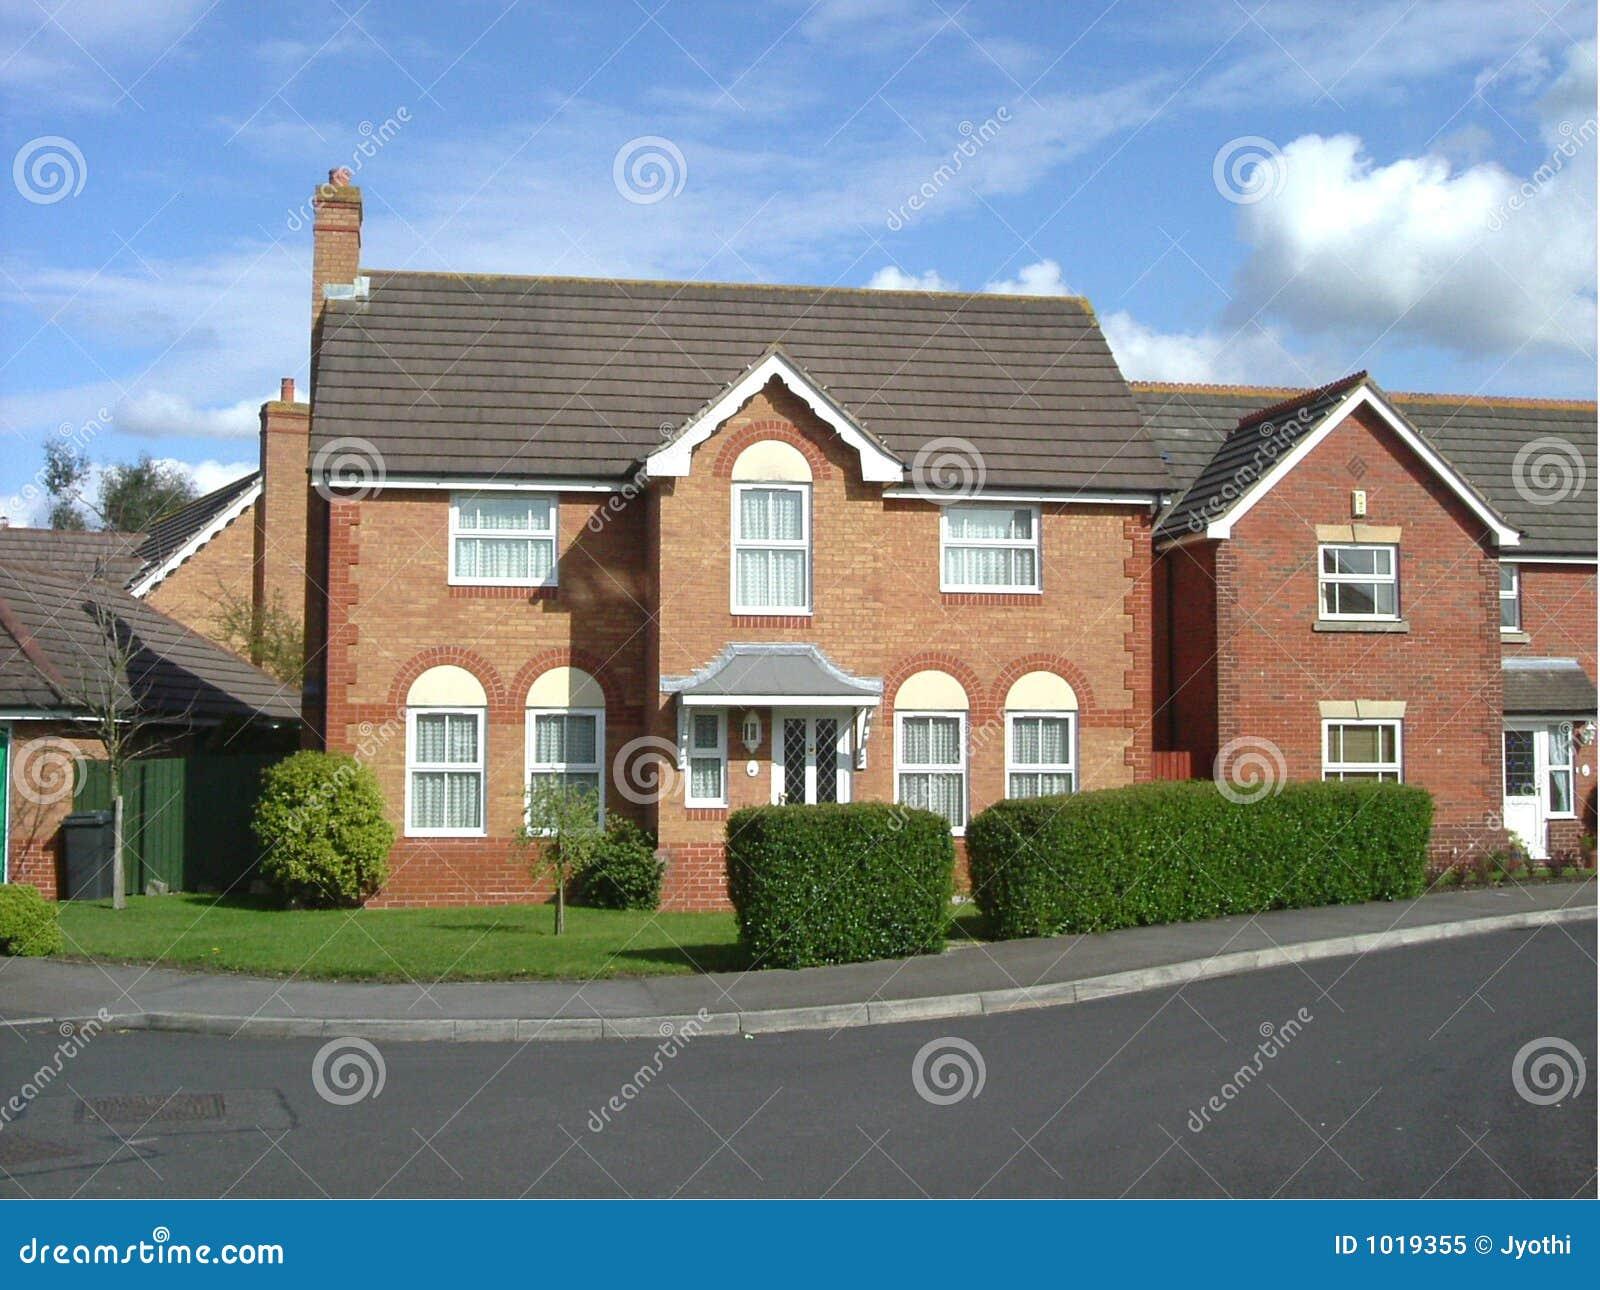 Single Story Home Plans Tiled British House Royalty Free Stock Photo Image 1019355